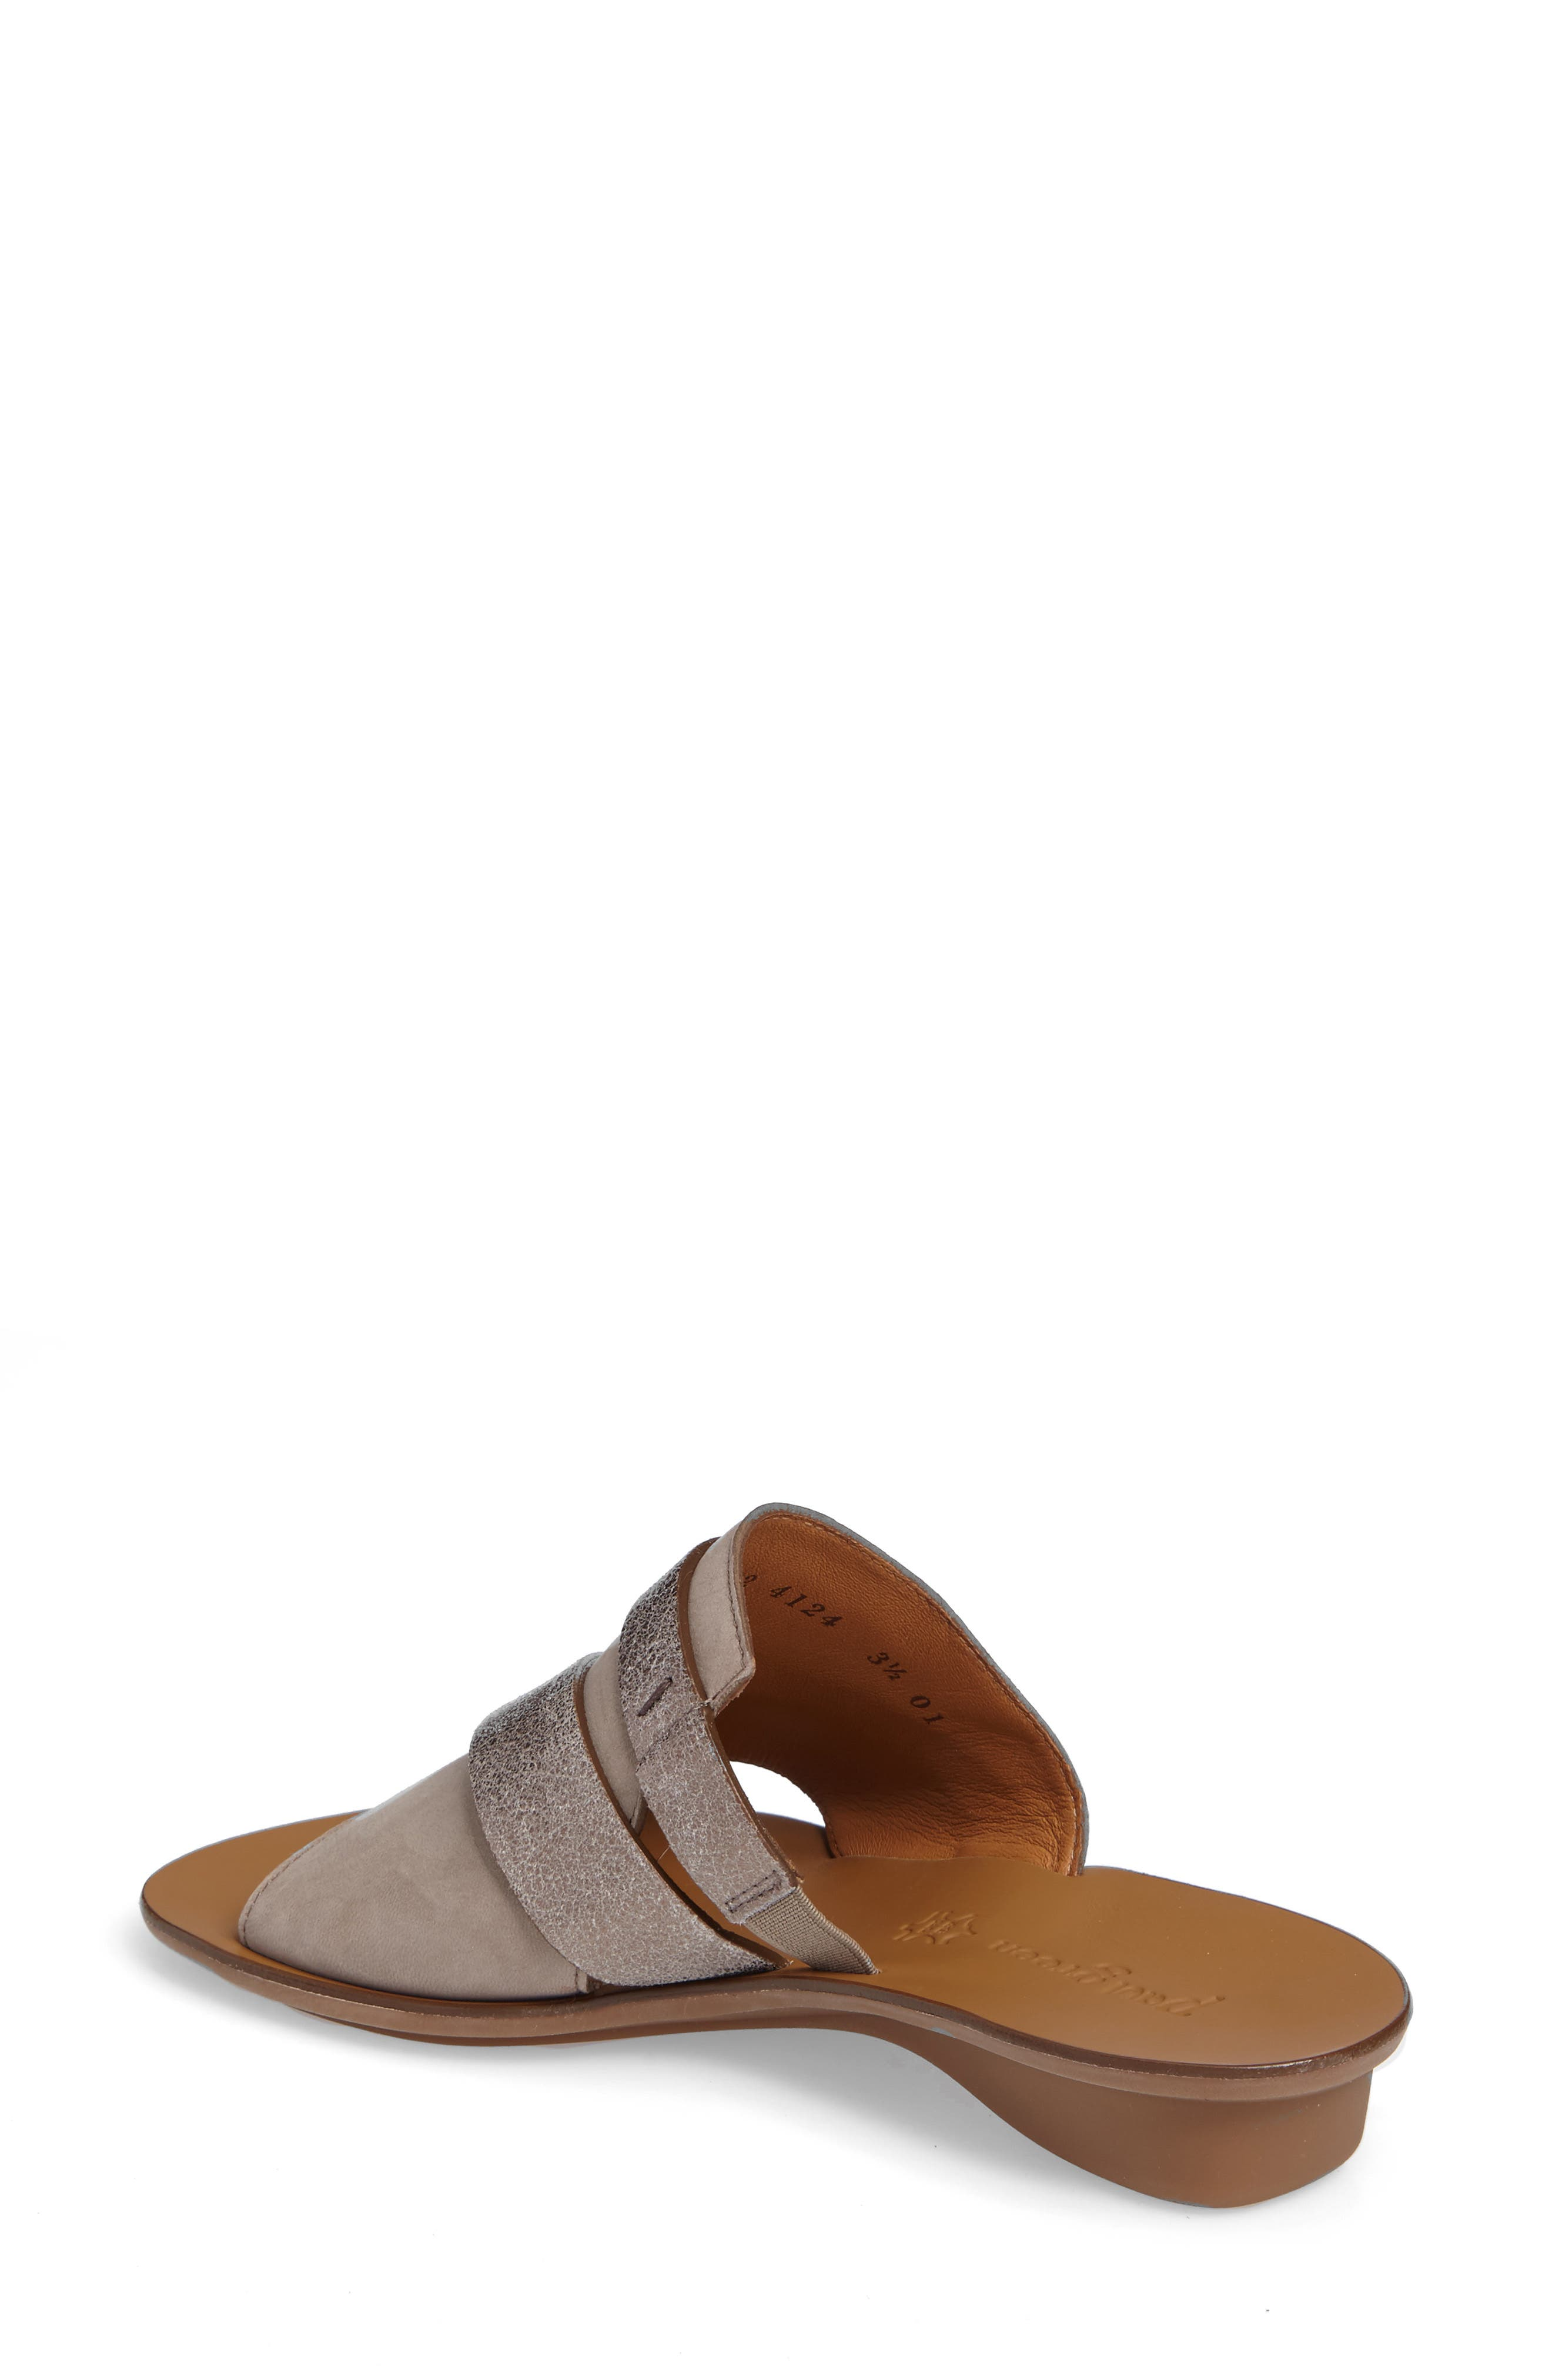 'Bayside' Leather Sandal,                             Alternate thumbnail 2, color,                             GREY